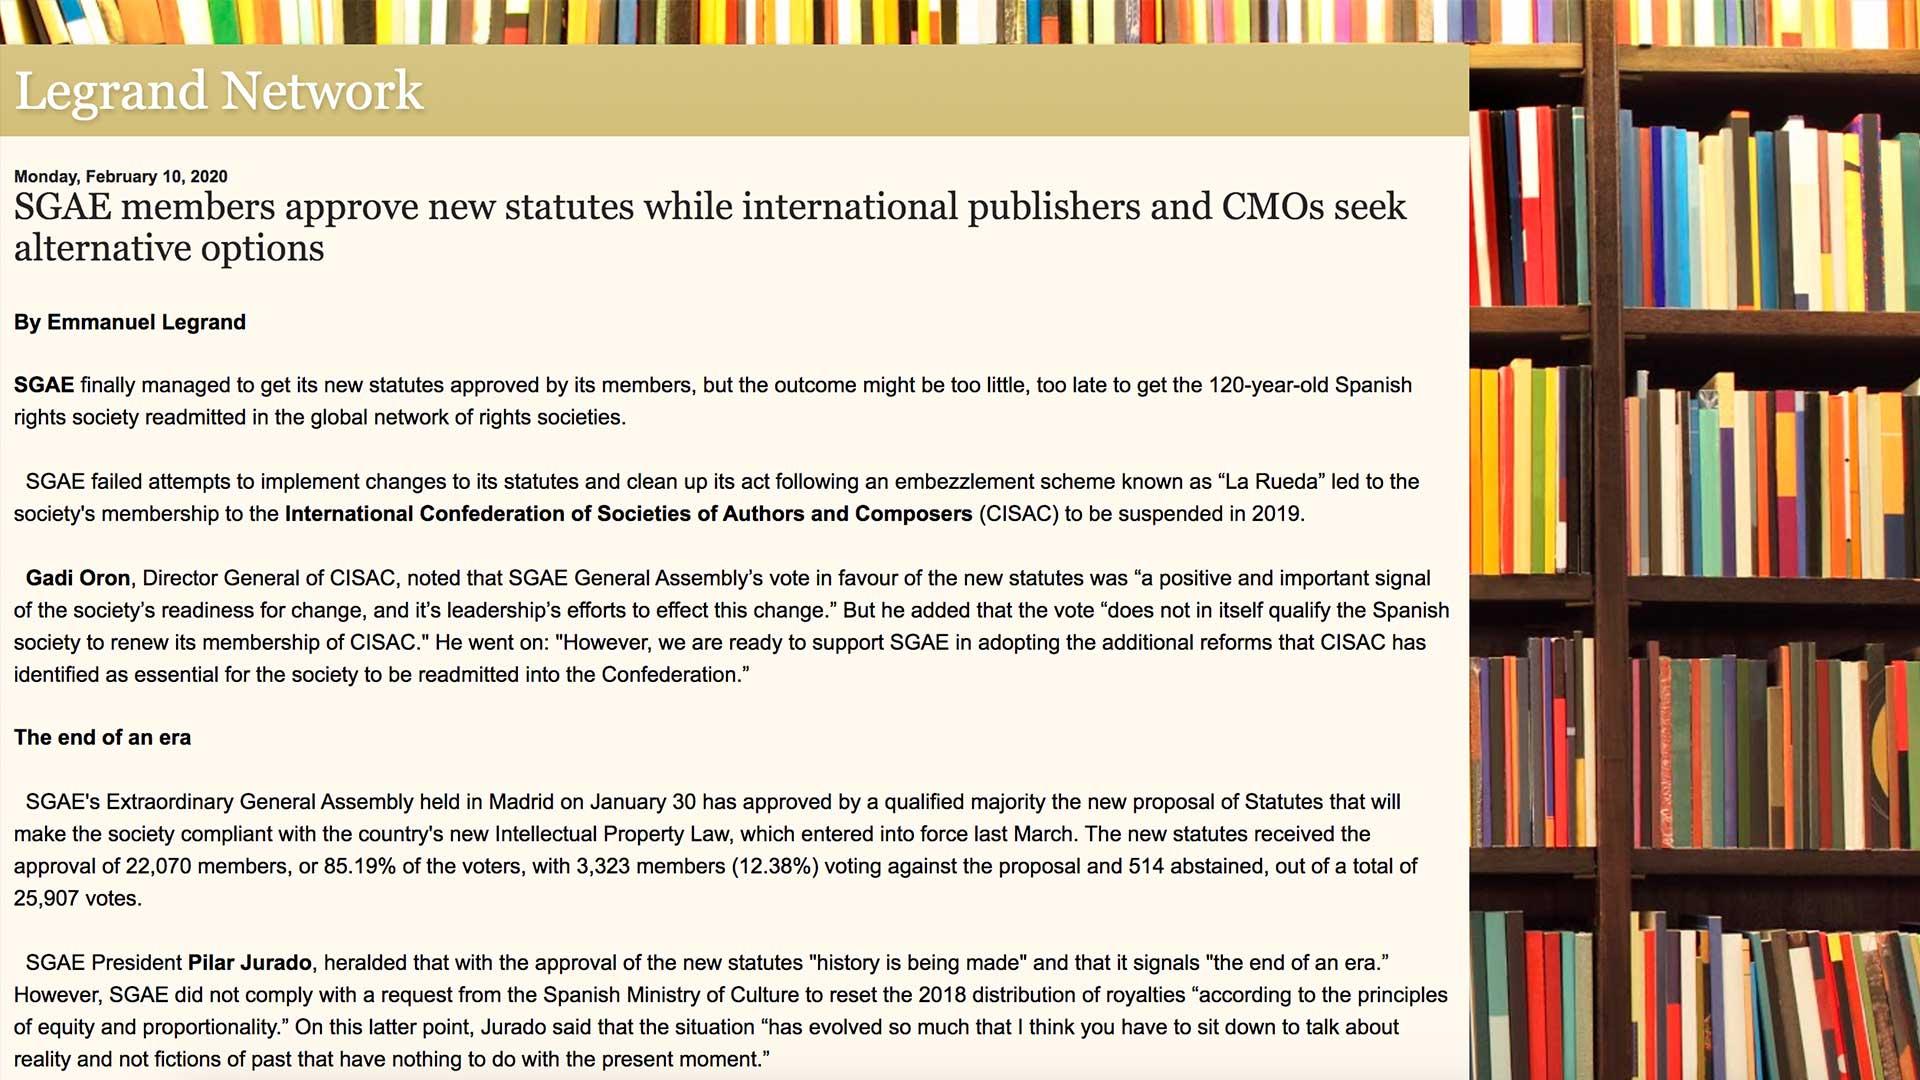 Fairness Rocks News SGAE members approve new statutes while international publishers and CMOs seek alternative options